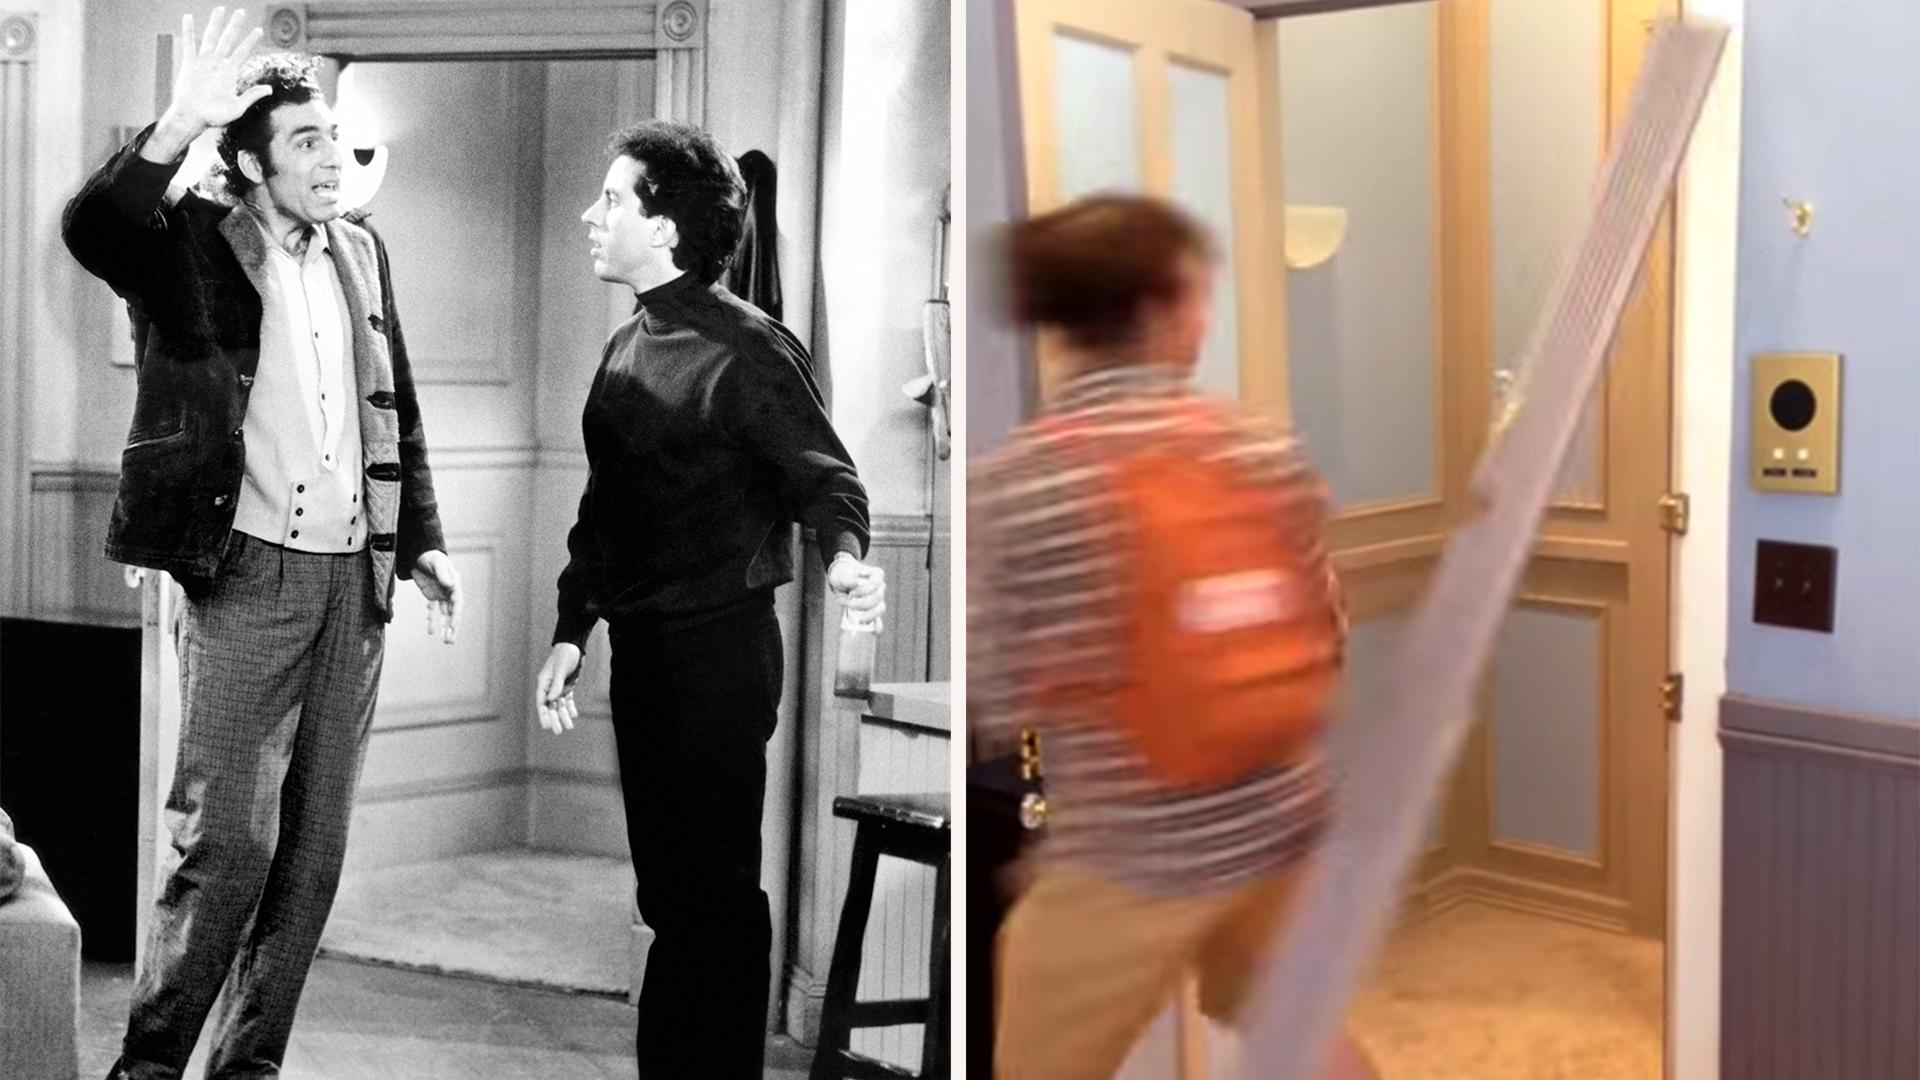 Man breaks door at \u0027Seinfeld\u0027 replica while making Kramer entrance - TODAY.com  sc 1 th 168 & Man breaks door at \u0027Seinfeld\u0027 replica while making Kramer entrance ...